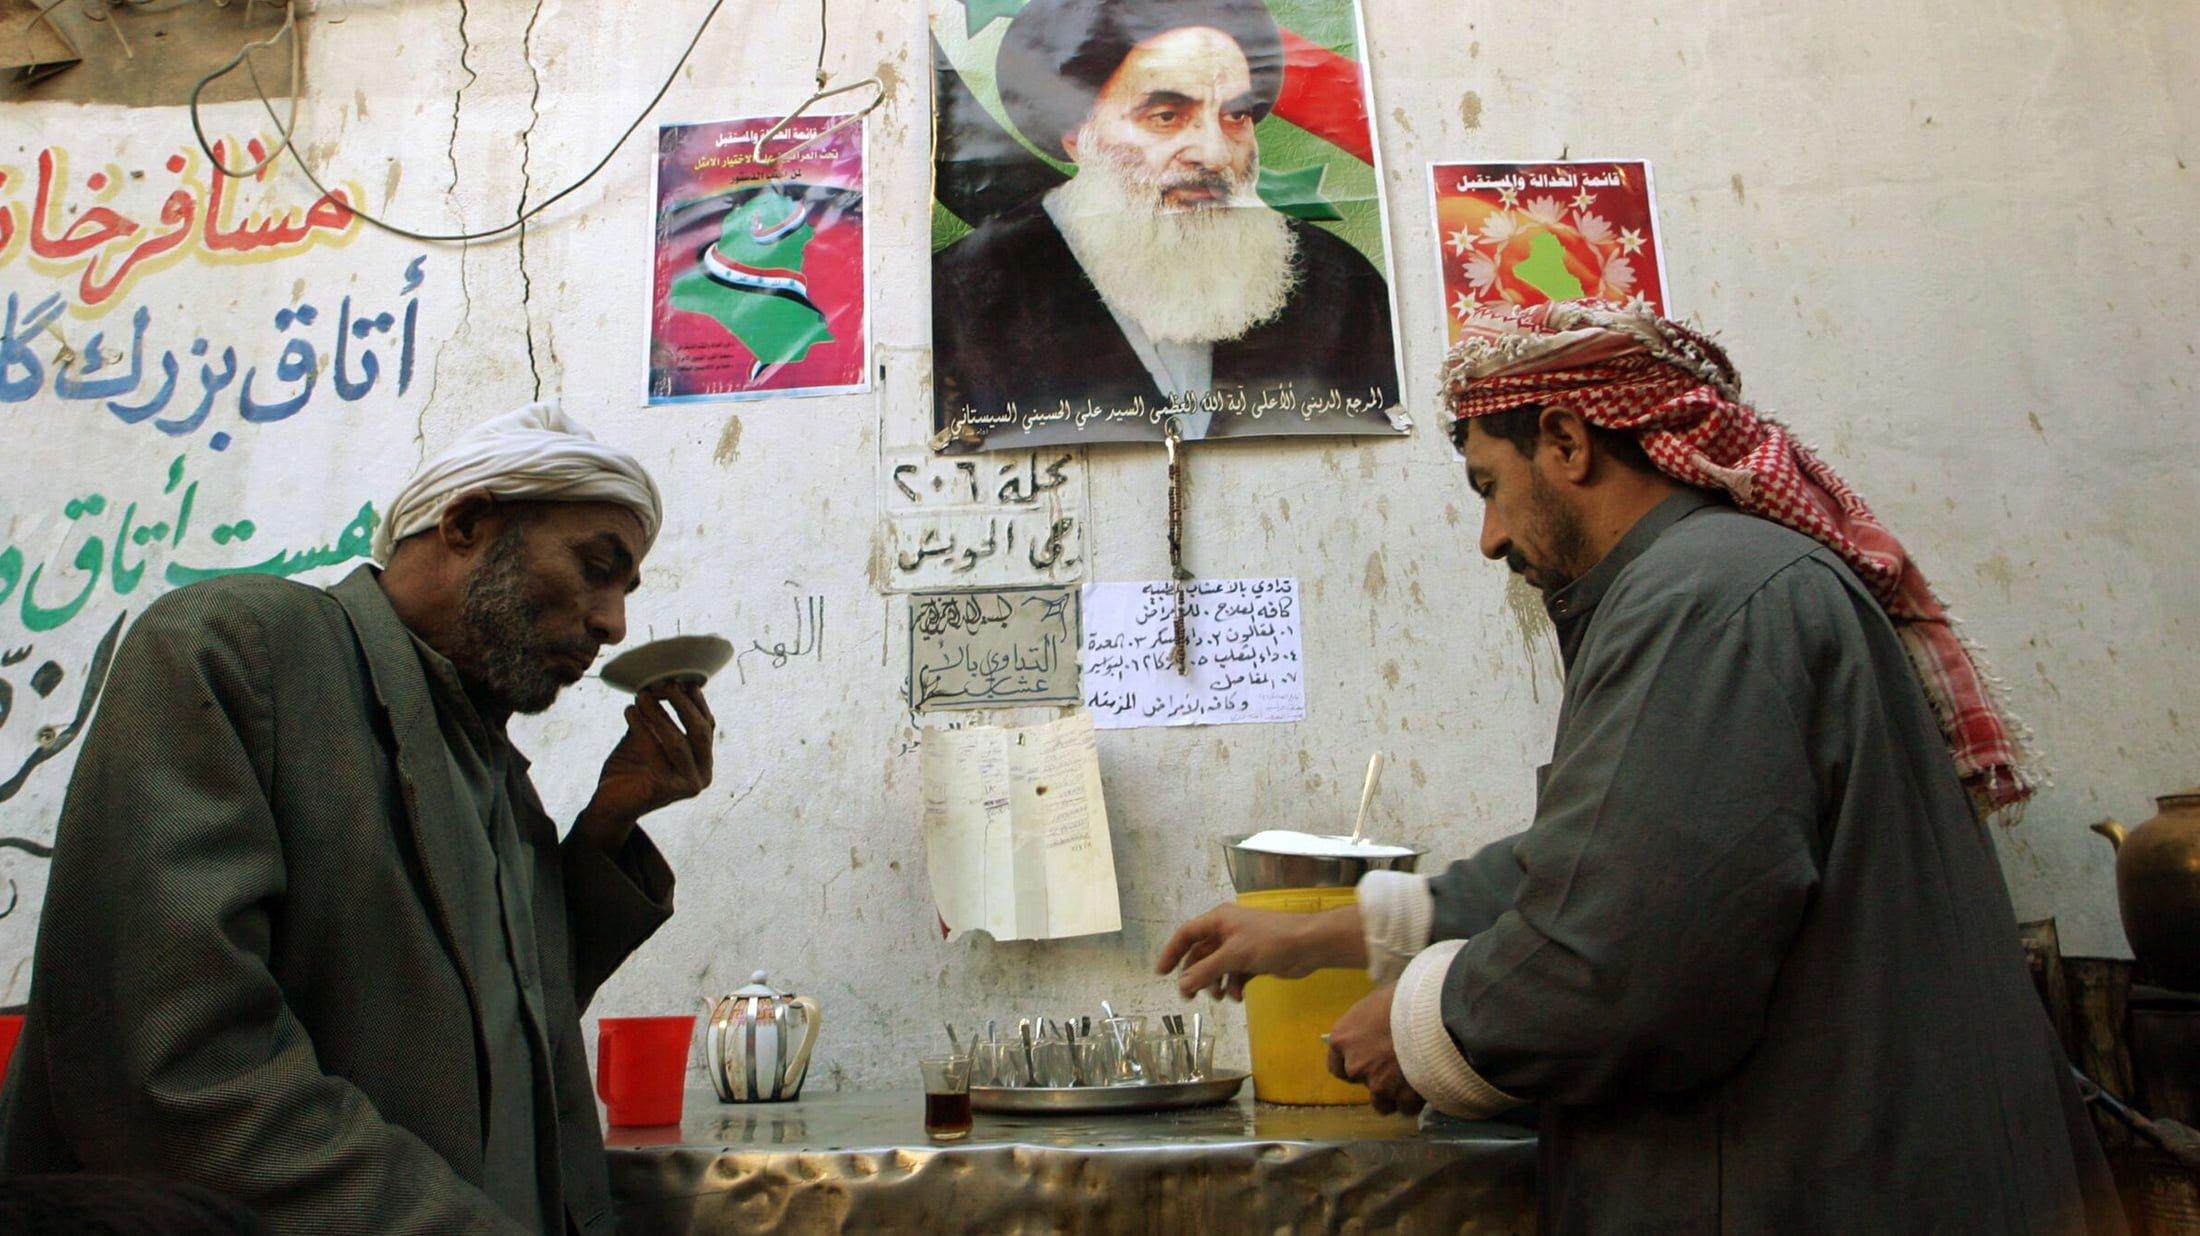 Men sit under poster of Shi'ite leader Sistani as they drink tea in Najaf.